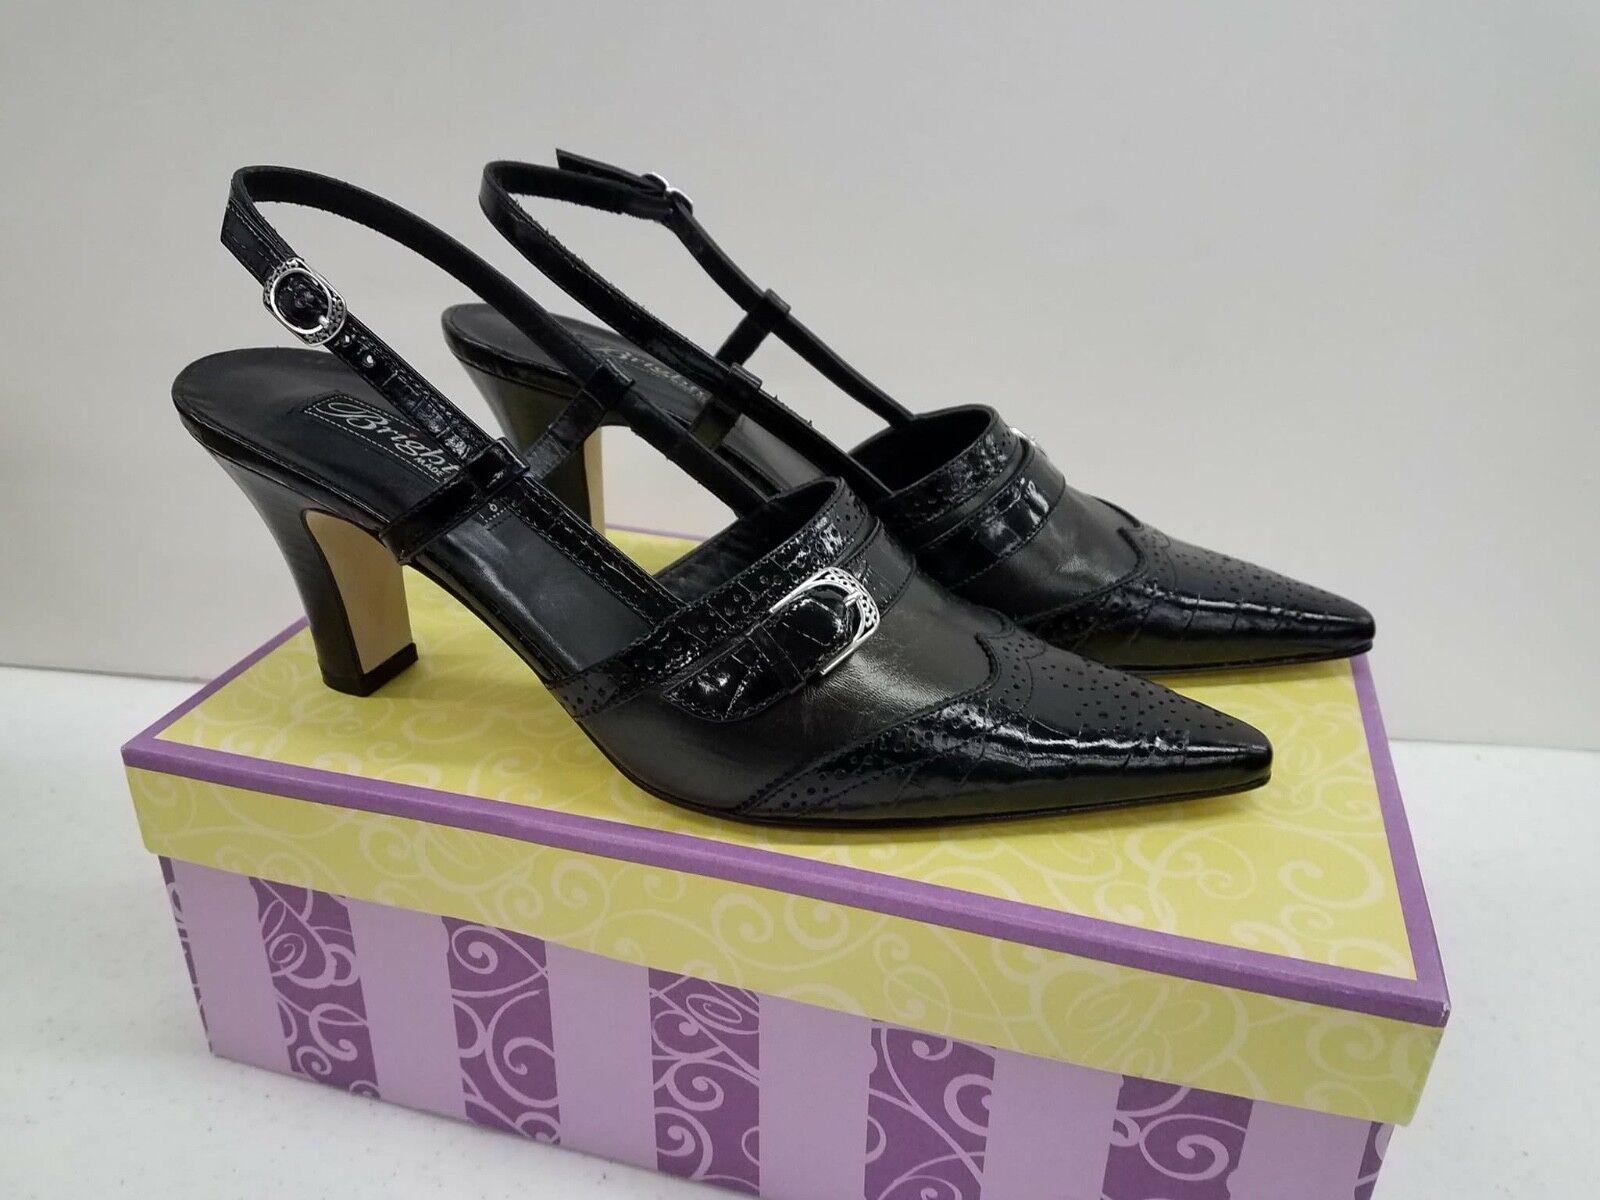 Brighton Mersey Black Croc Brush Leather Madras w/ Silver Buckles Sz 8M $190